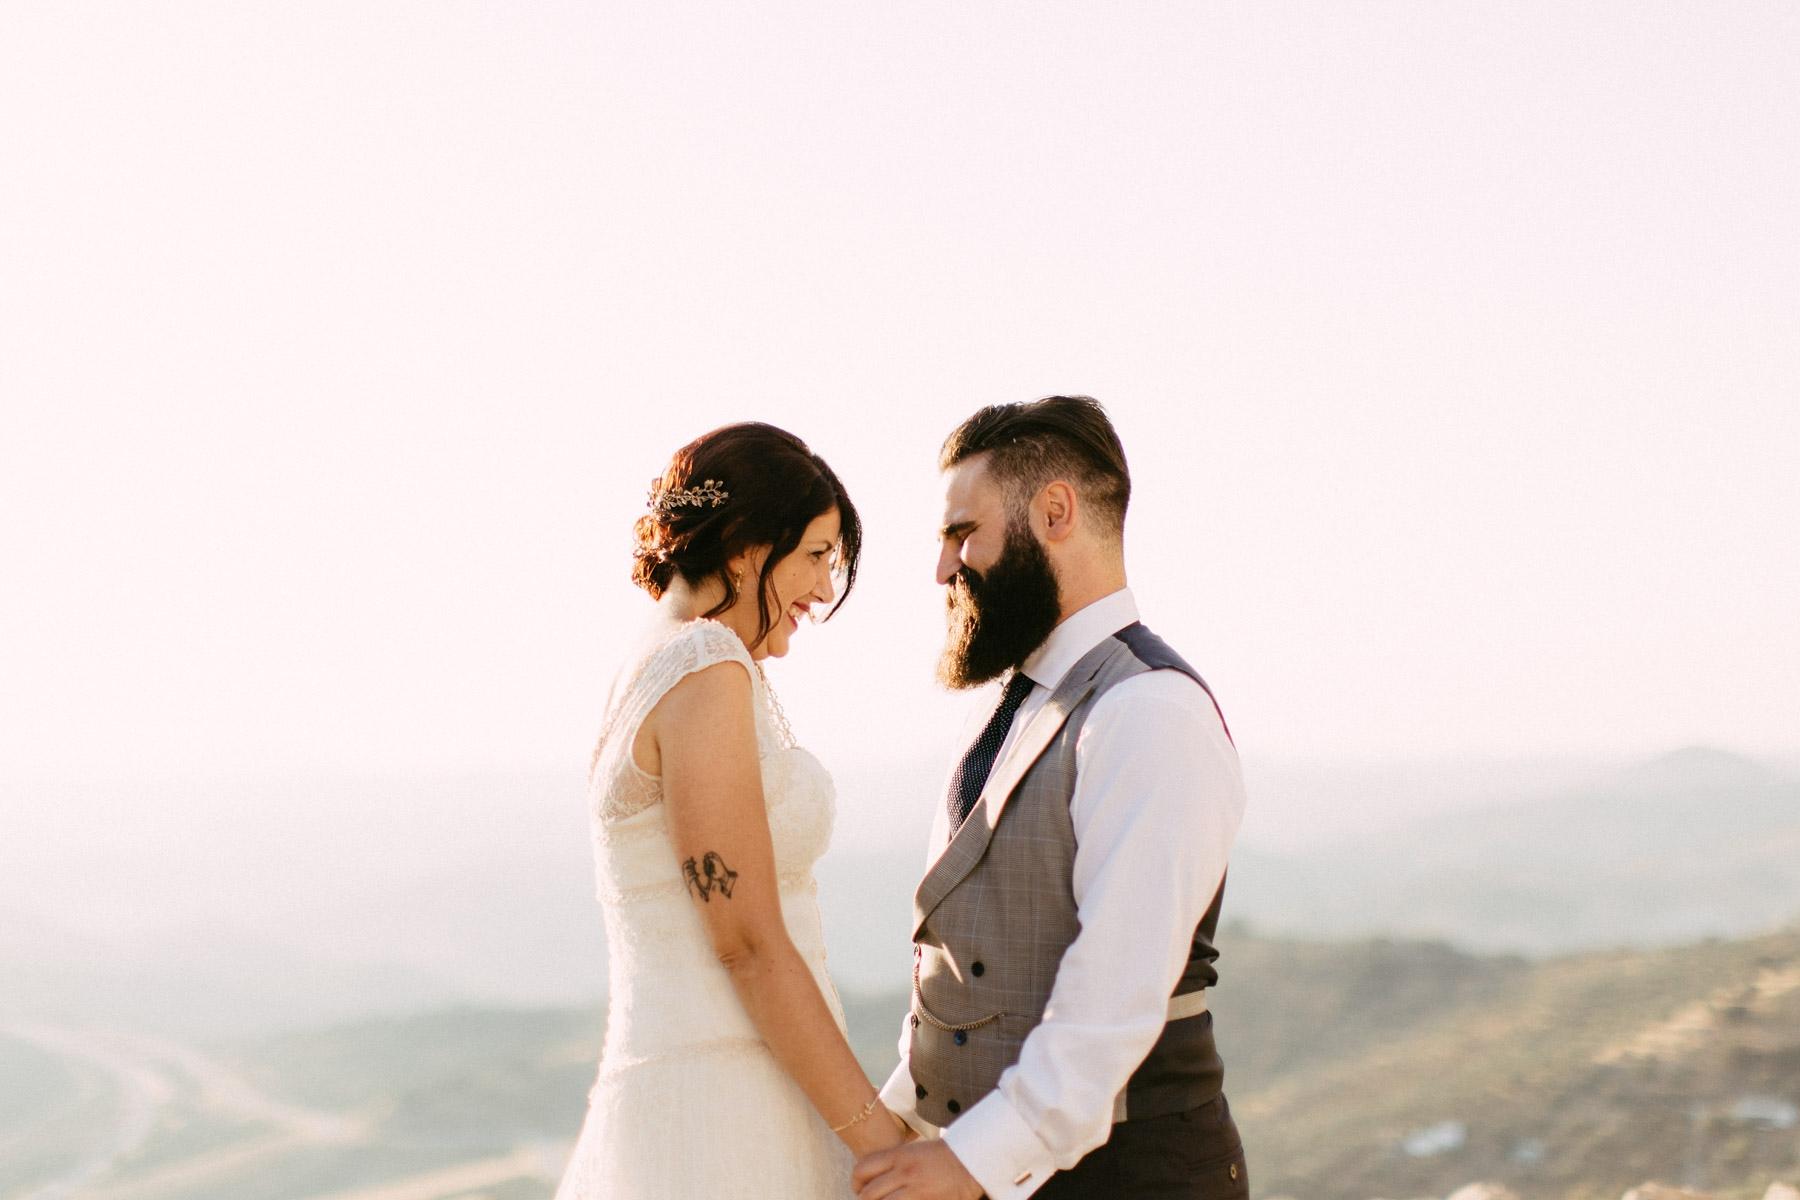 fotografo de bodas Jairo Crena-228